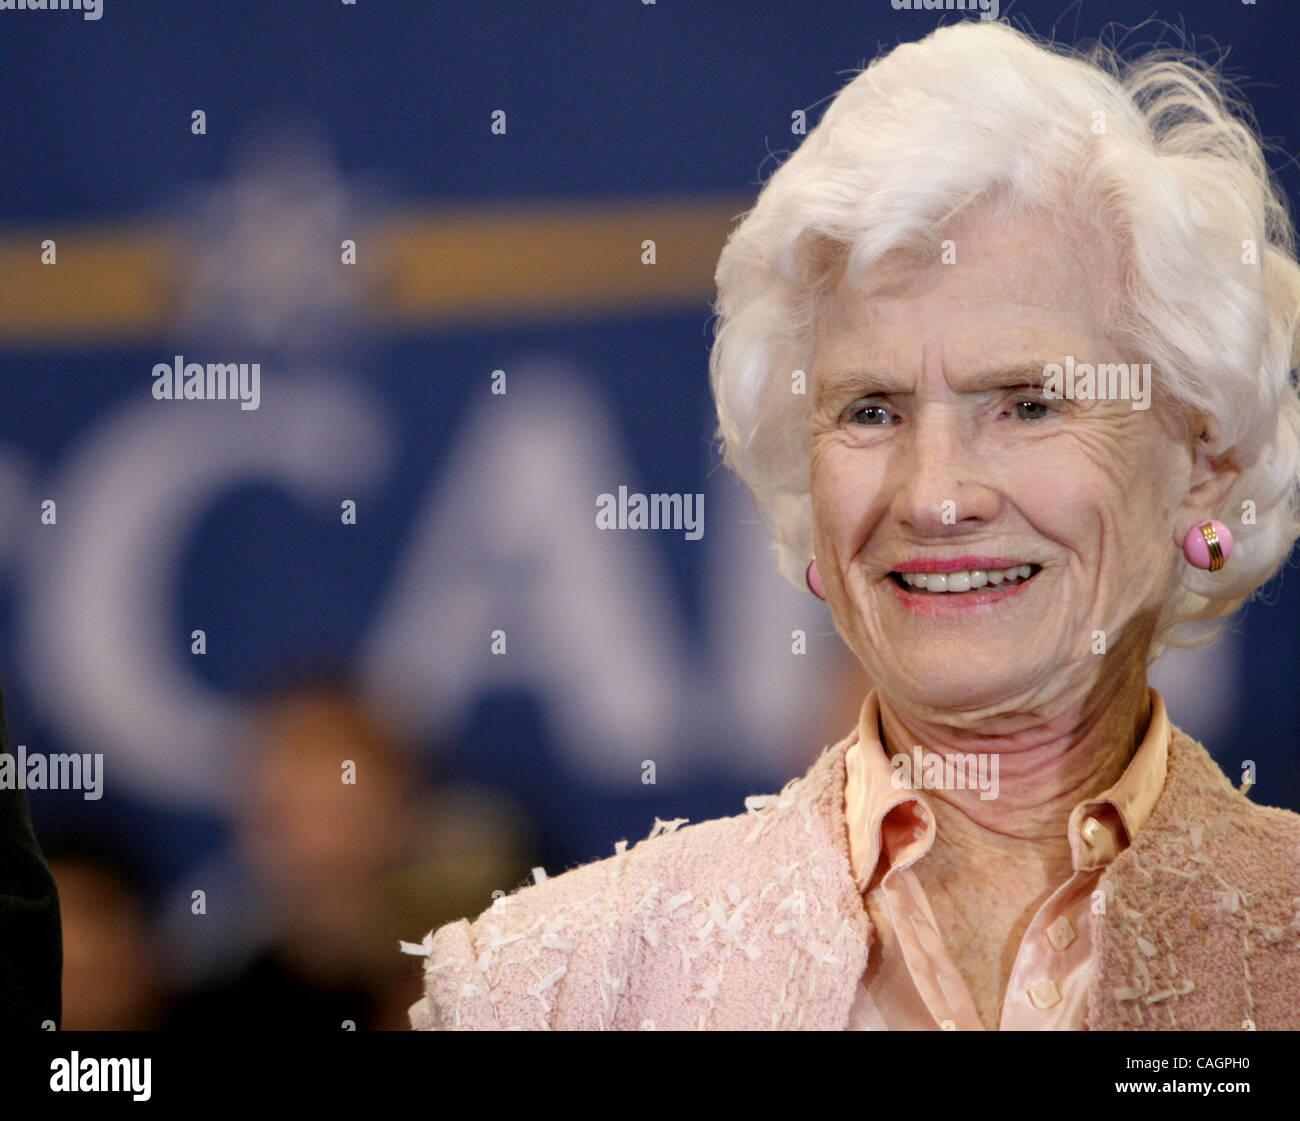 Meghan Mccain Cries During John Mccain S Arizona Service: Roberta Mccain Stock Photos & Roberta Mccain Stock Images